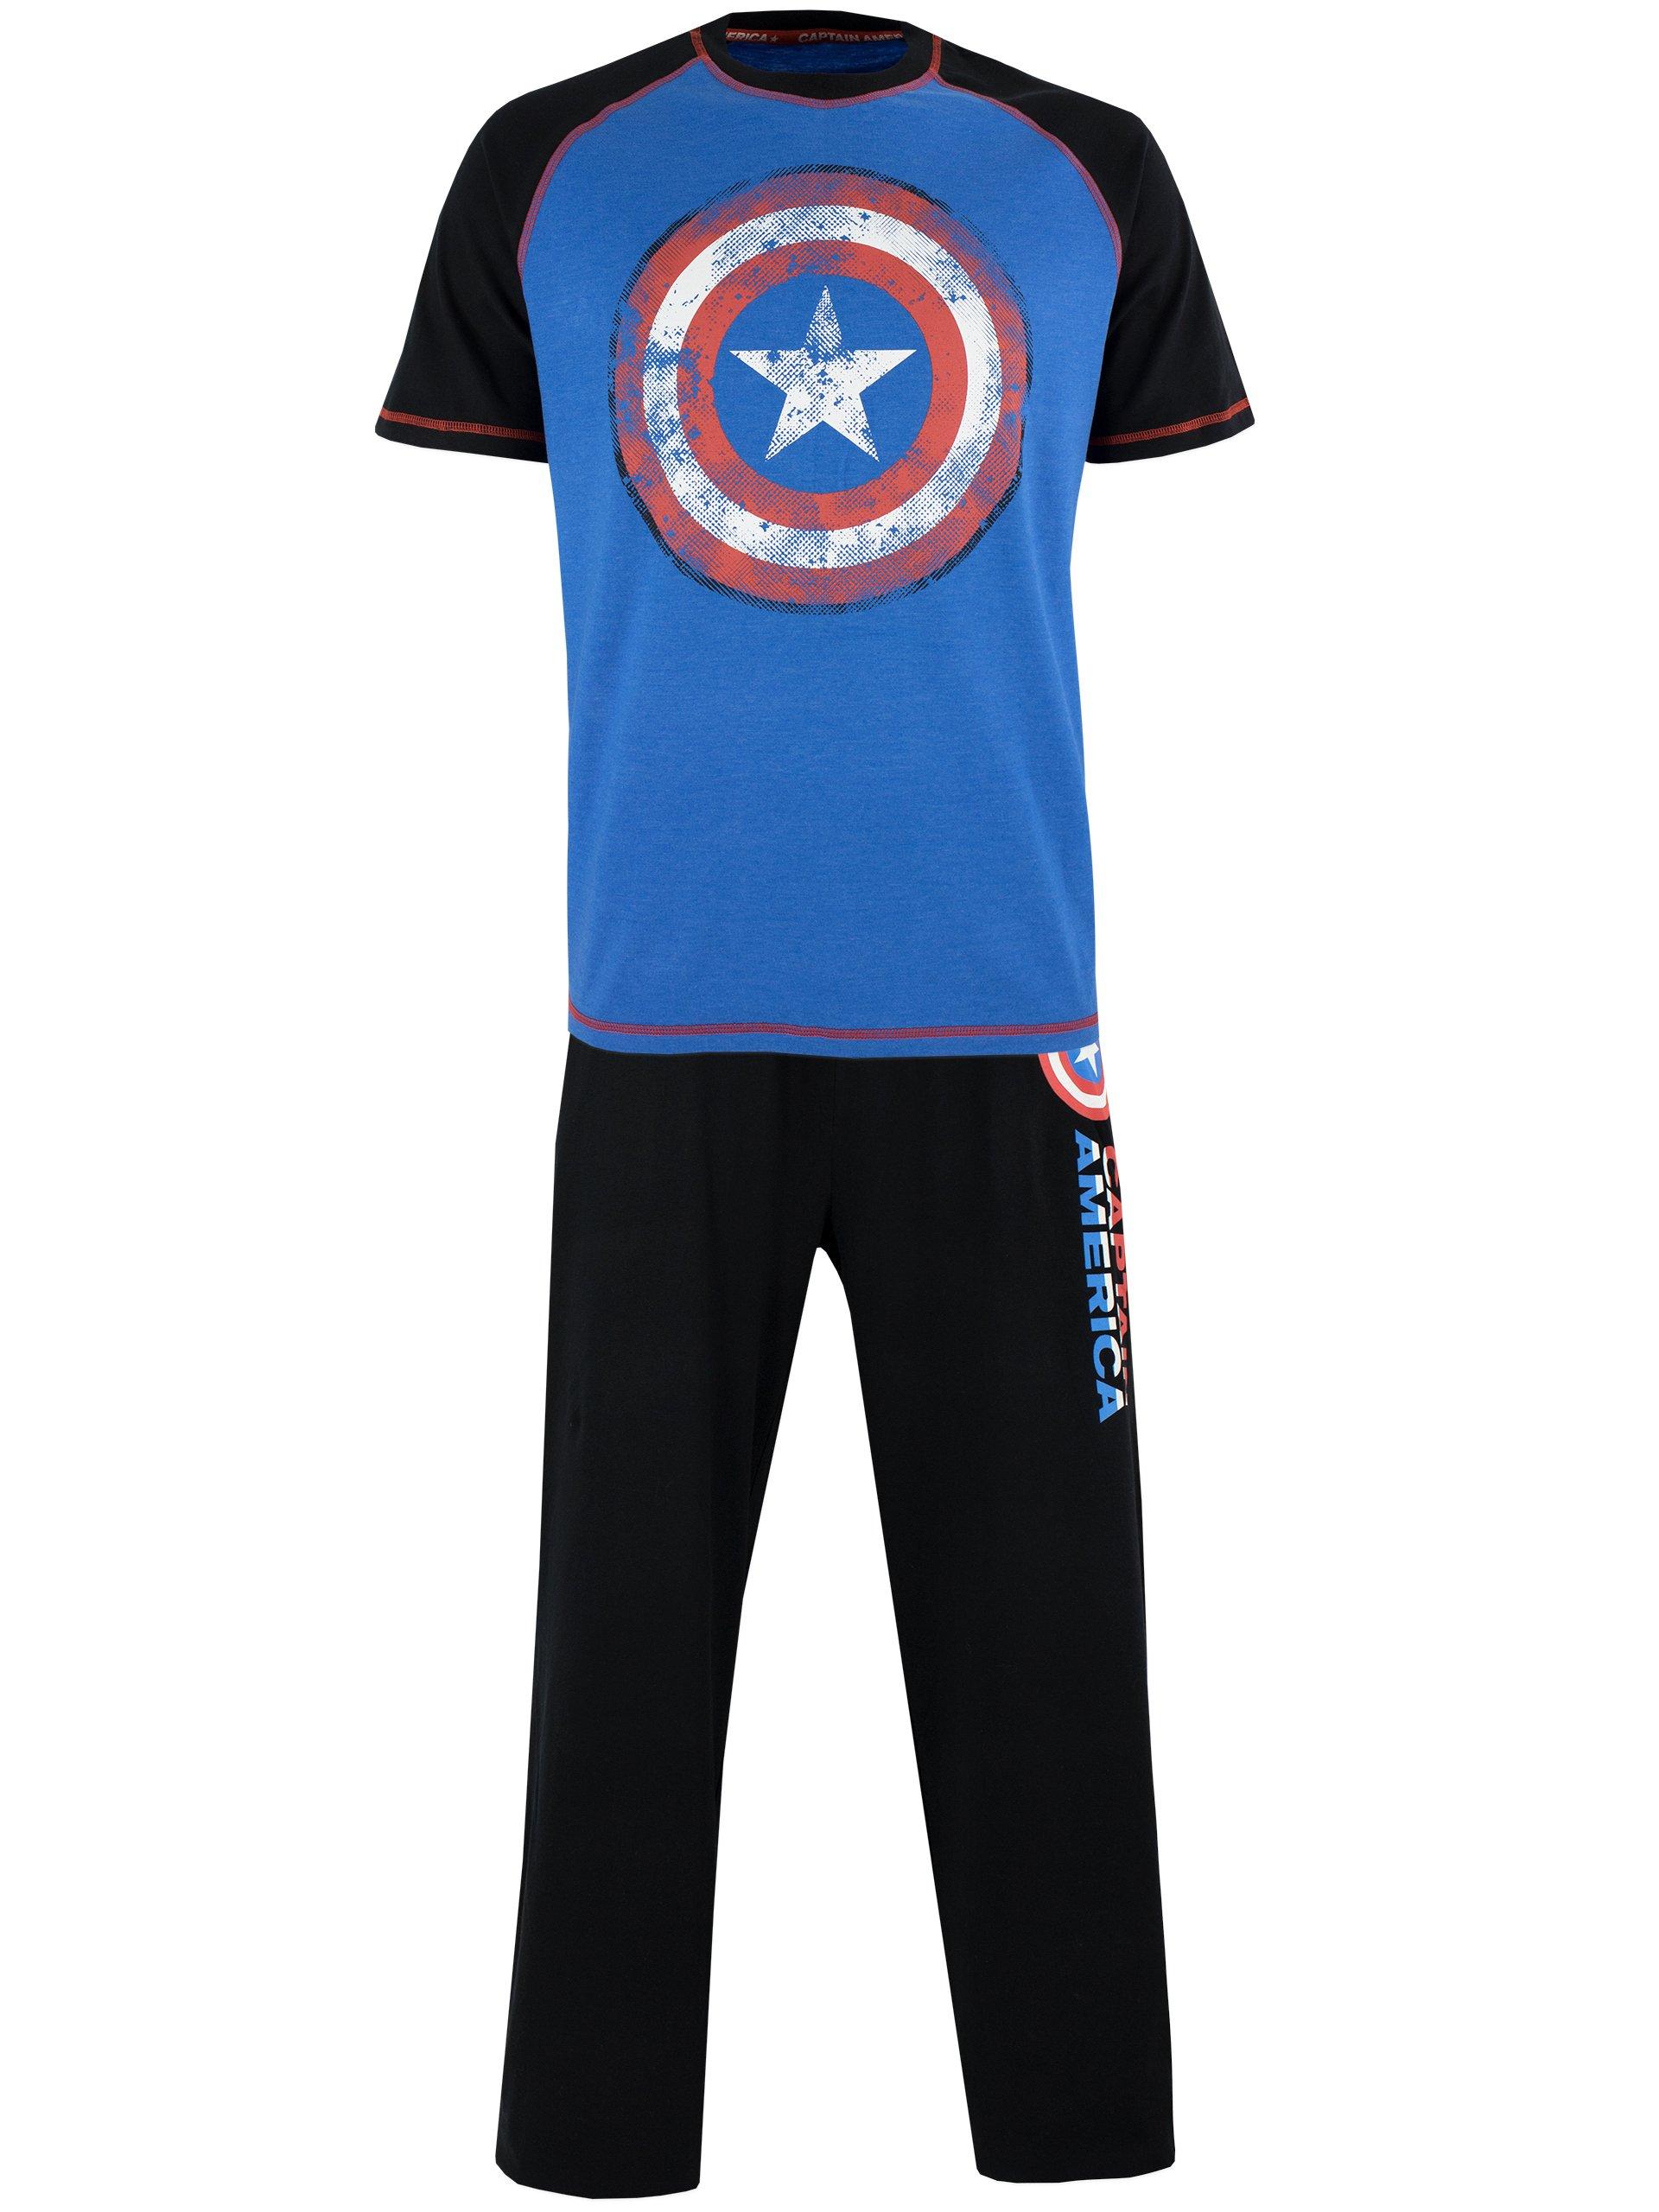 Marvel - Pijama para Hombre - Avengers Capitán América product image